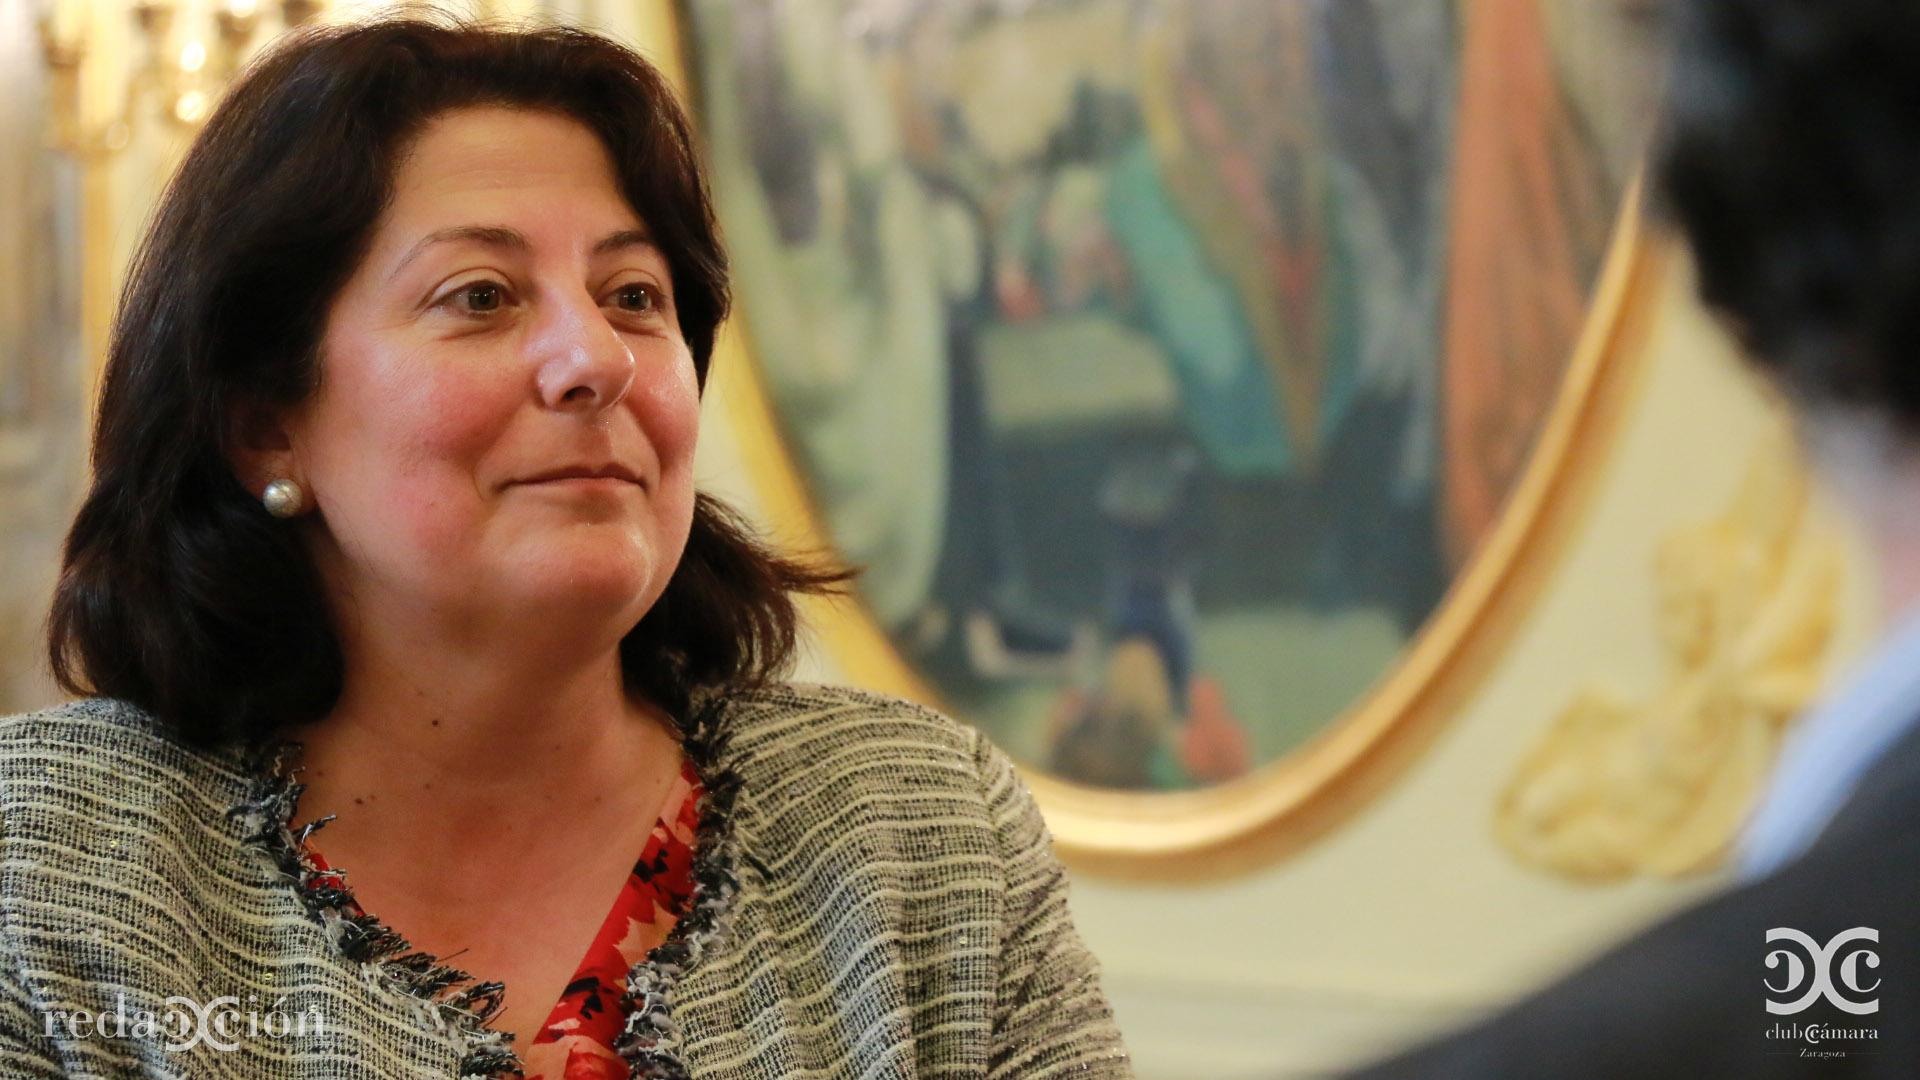 María López Palacín - Vicepresidenta 1ª Cámara Zaragoza